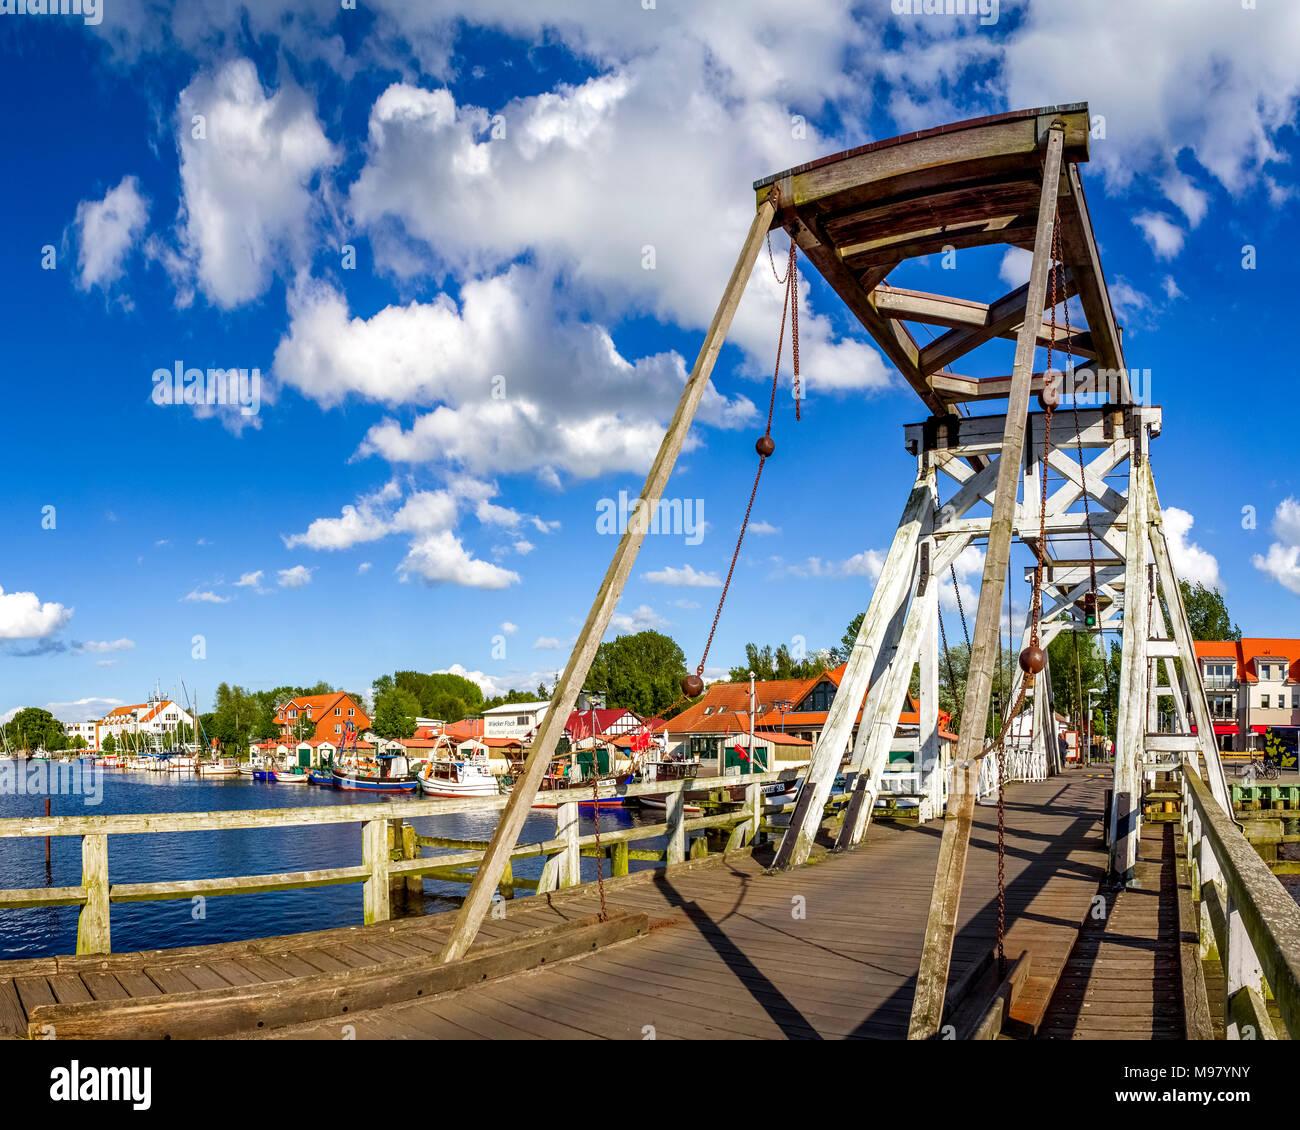 Germany, Mecklenburg-Western Pomerania, Greifswald, Wiecker bridge, wooden bascule bridge, river Ryck - Stock Image